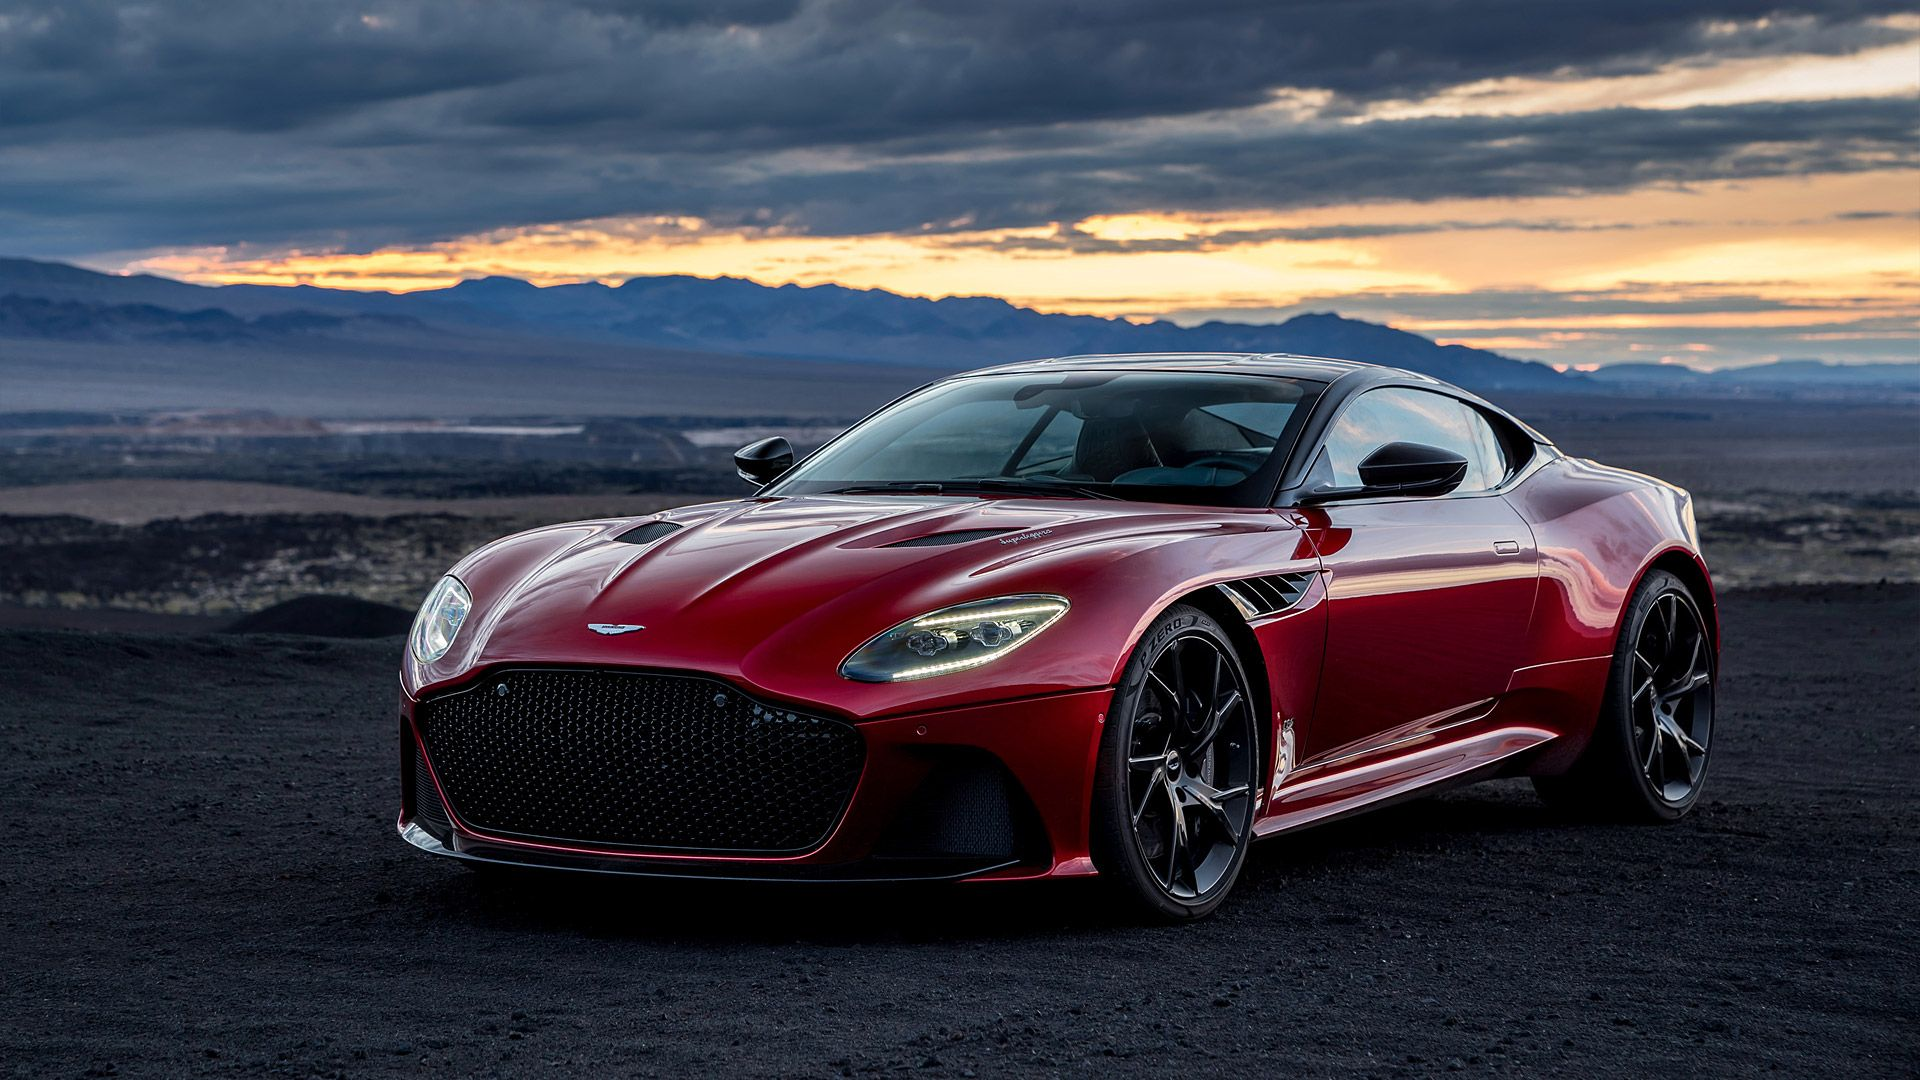 Aston Martin Dbs Wallpapers Top Free Aston Martin Dbs